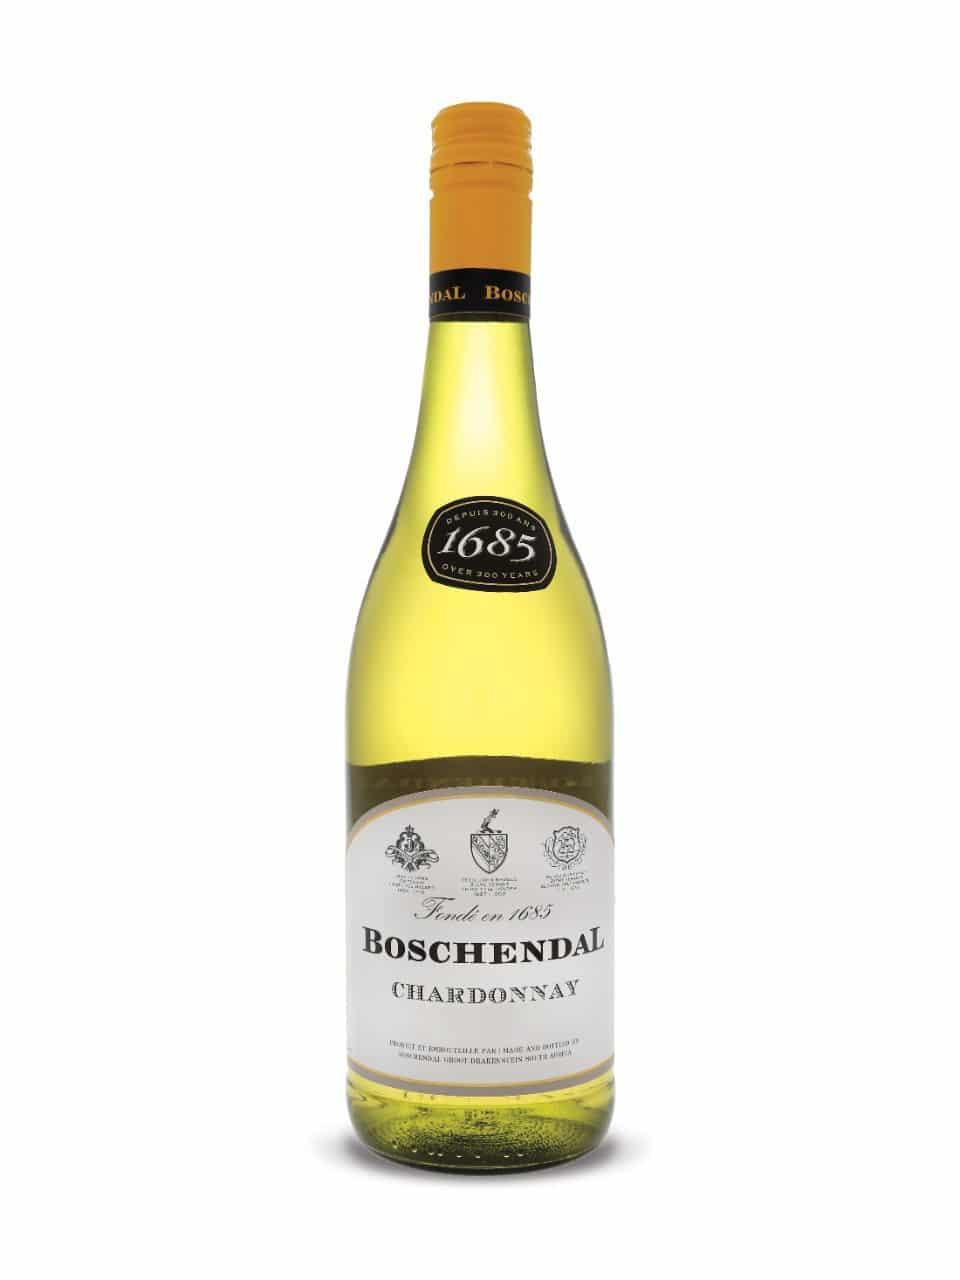 $15.95 - Boschendal Wines 2017 1685 Chardonnay